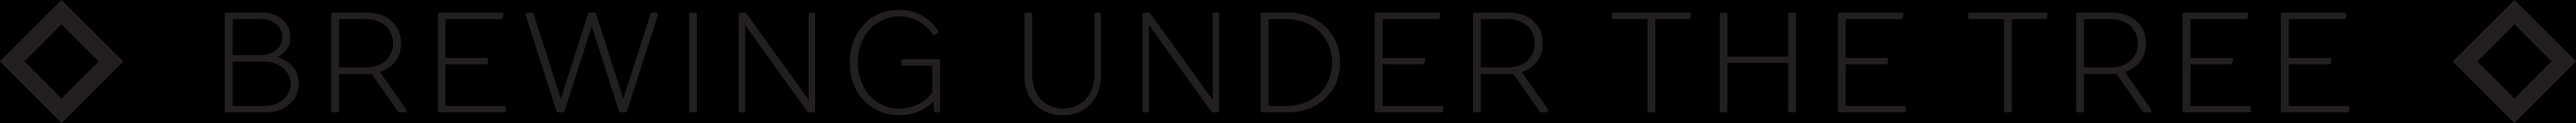 Cafeoro logo